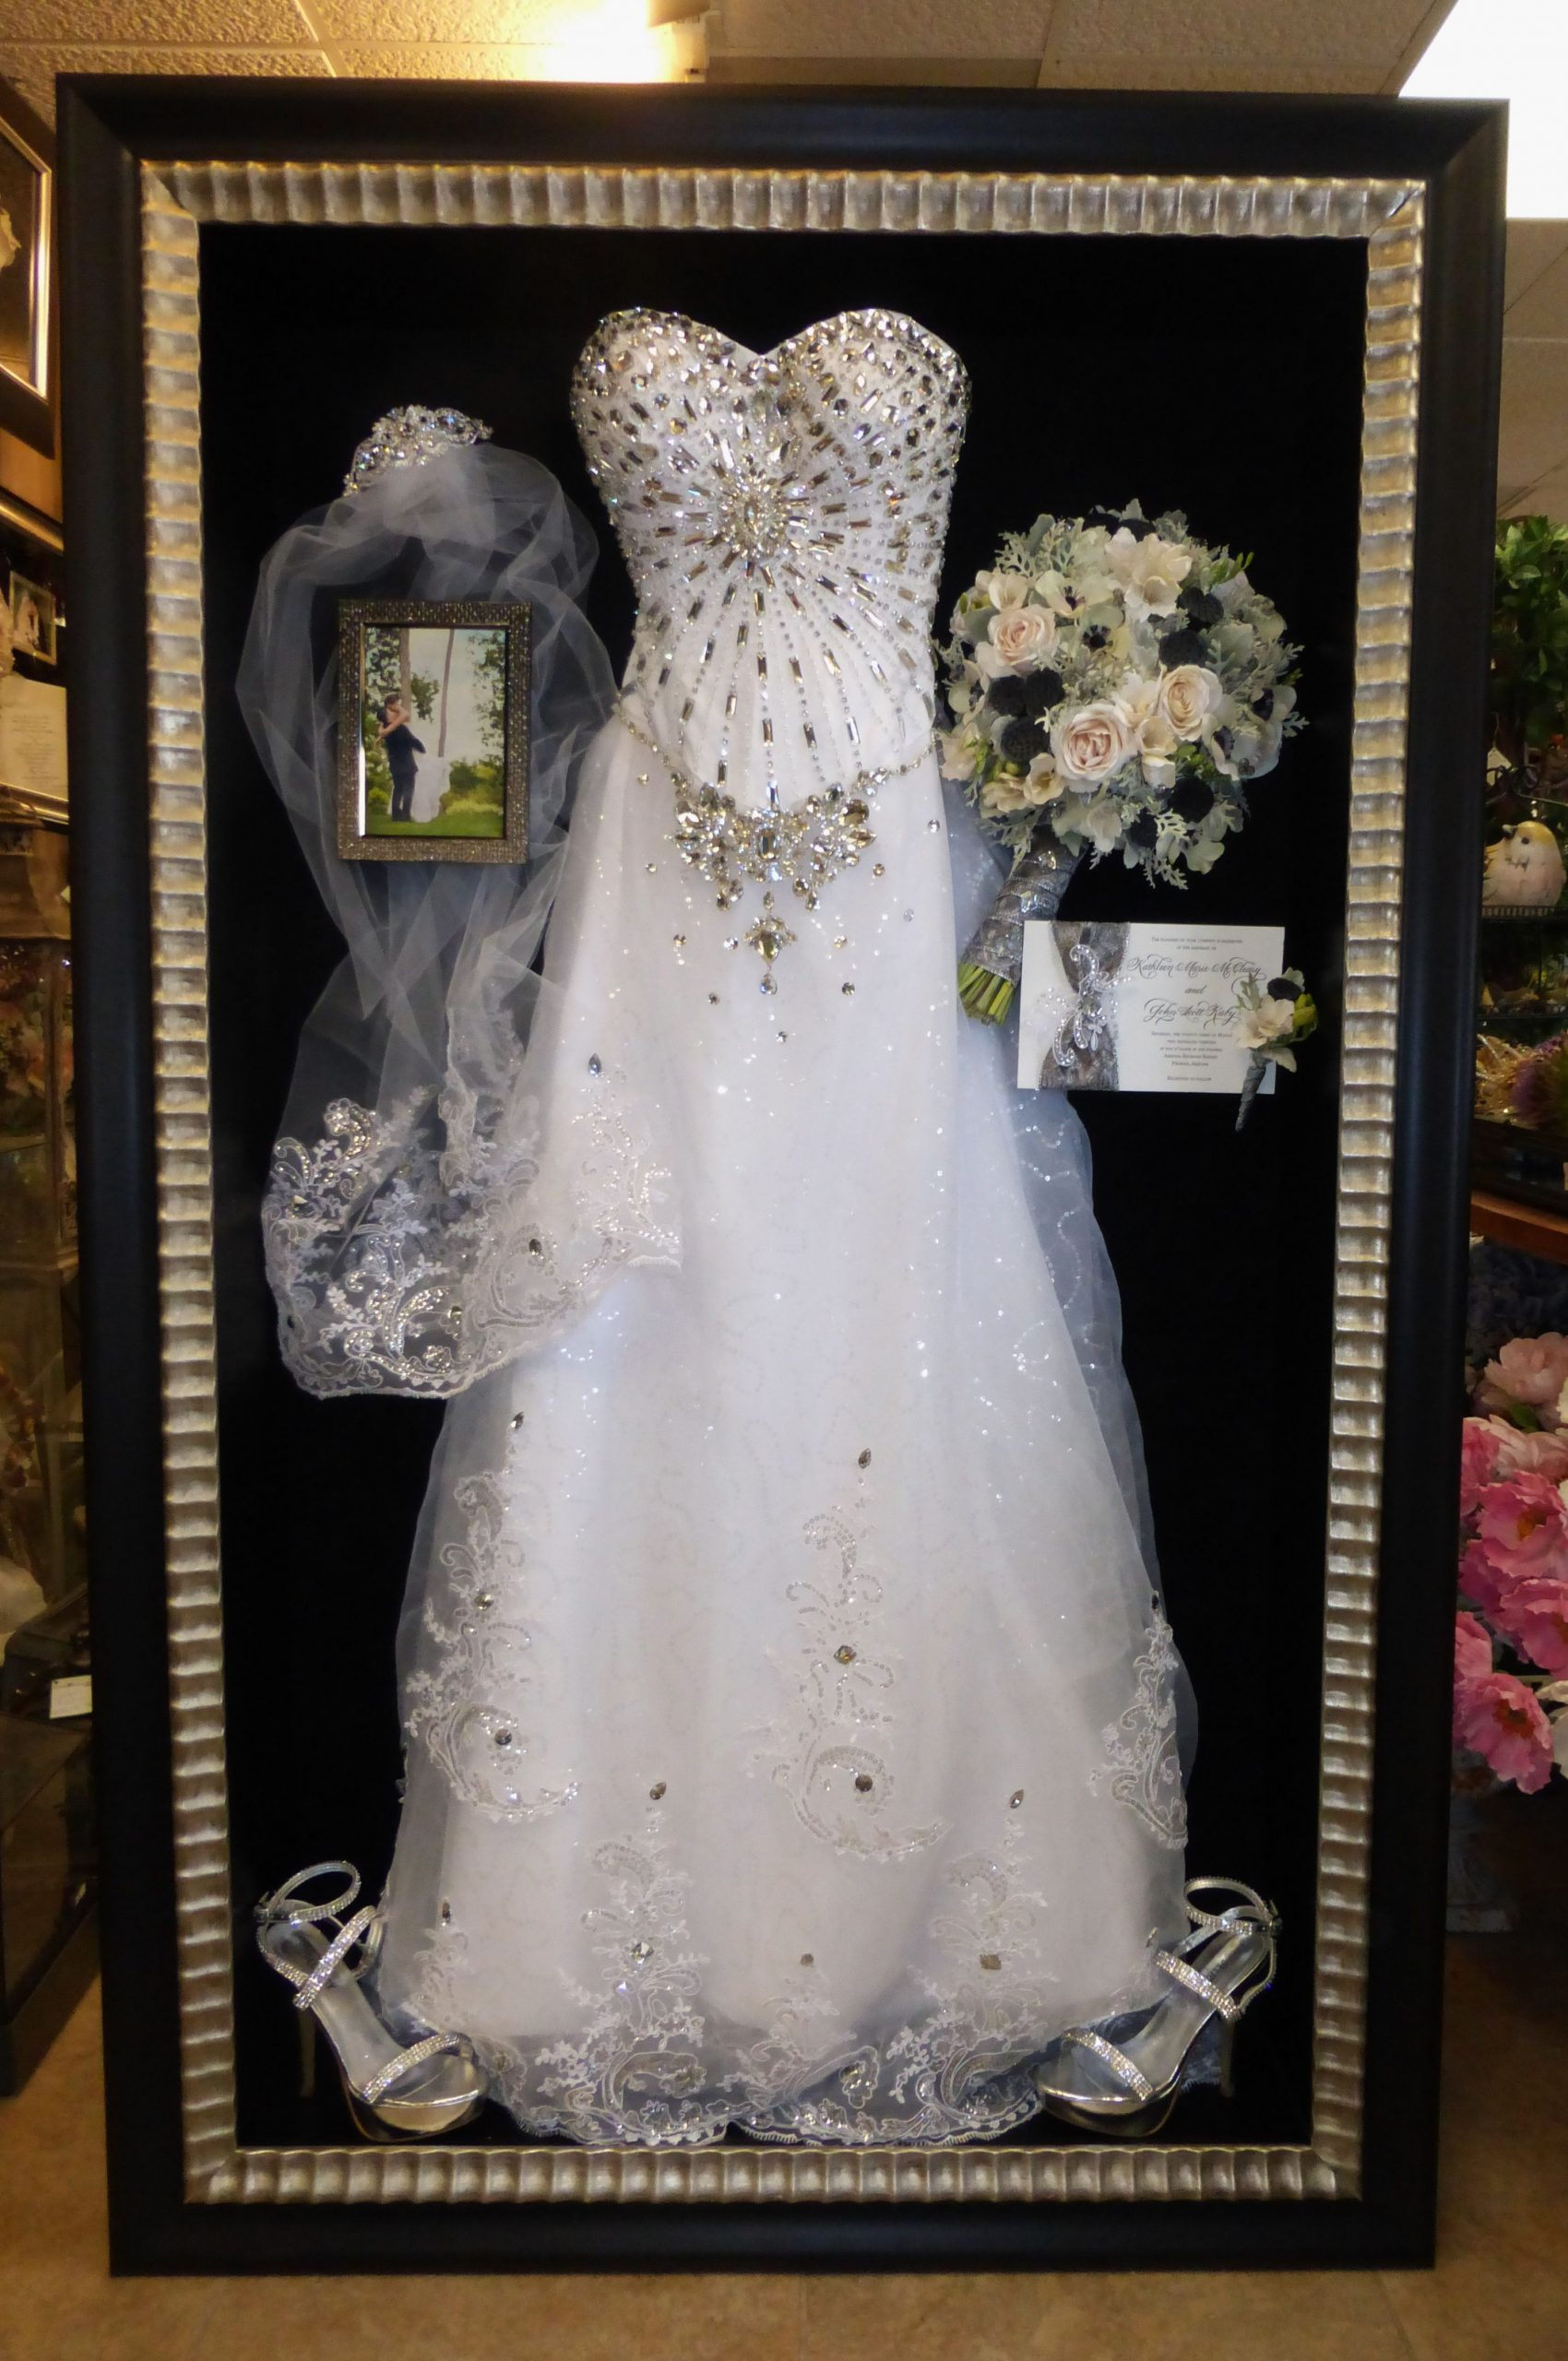 Framed Wedding Dress And Preserved Freezedried Bouquet